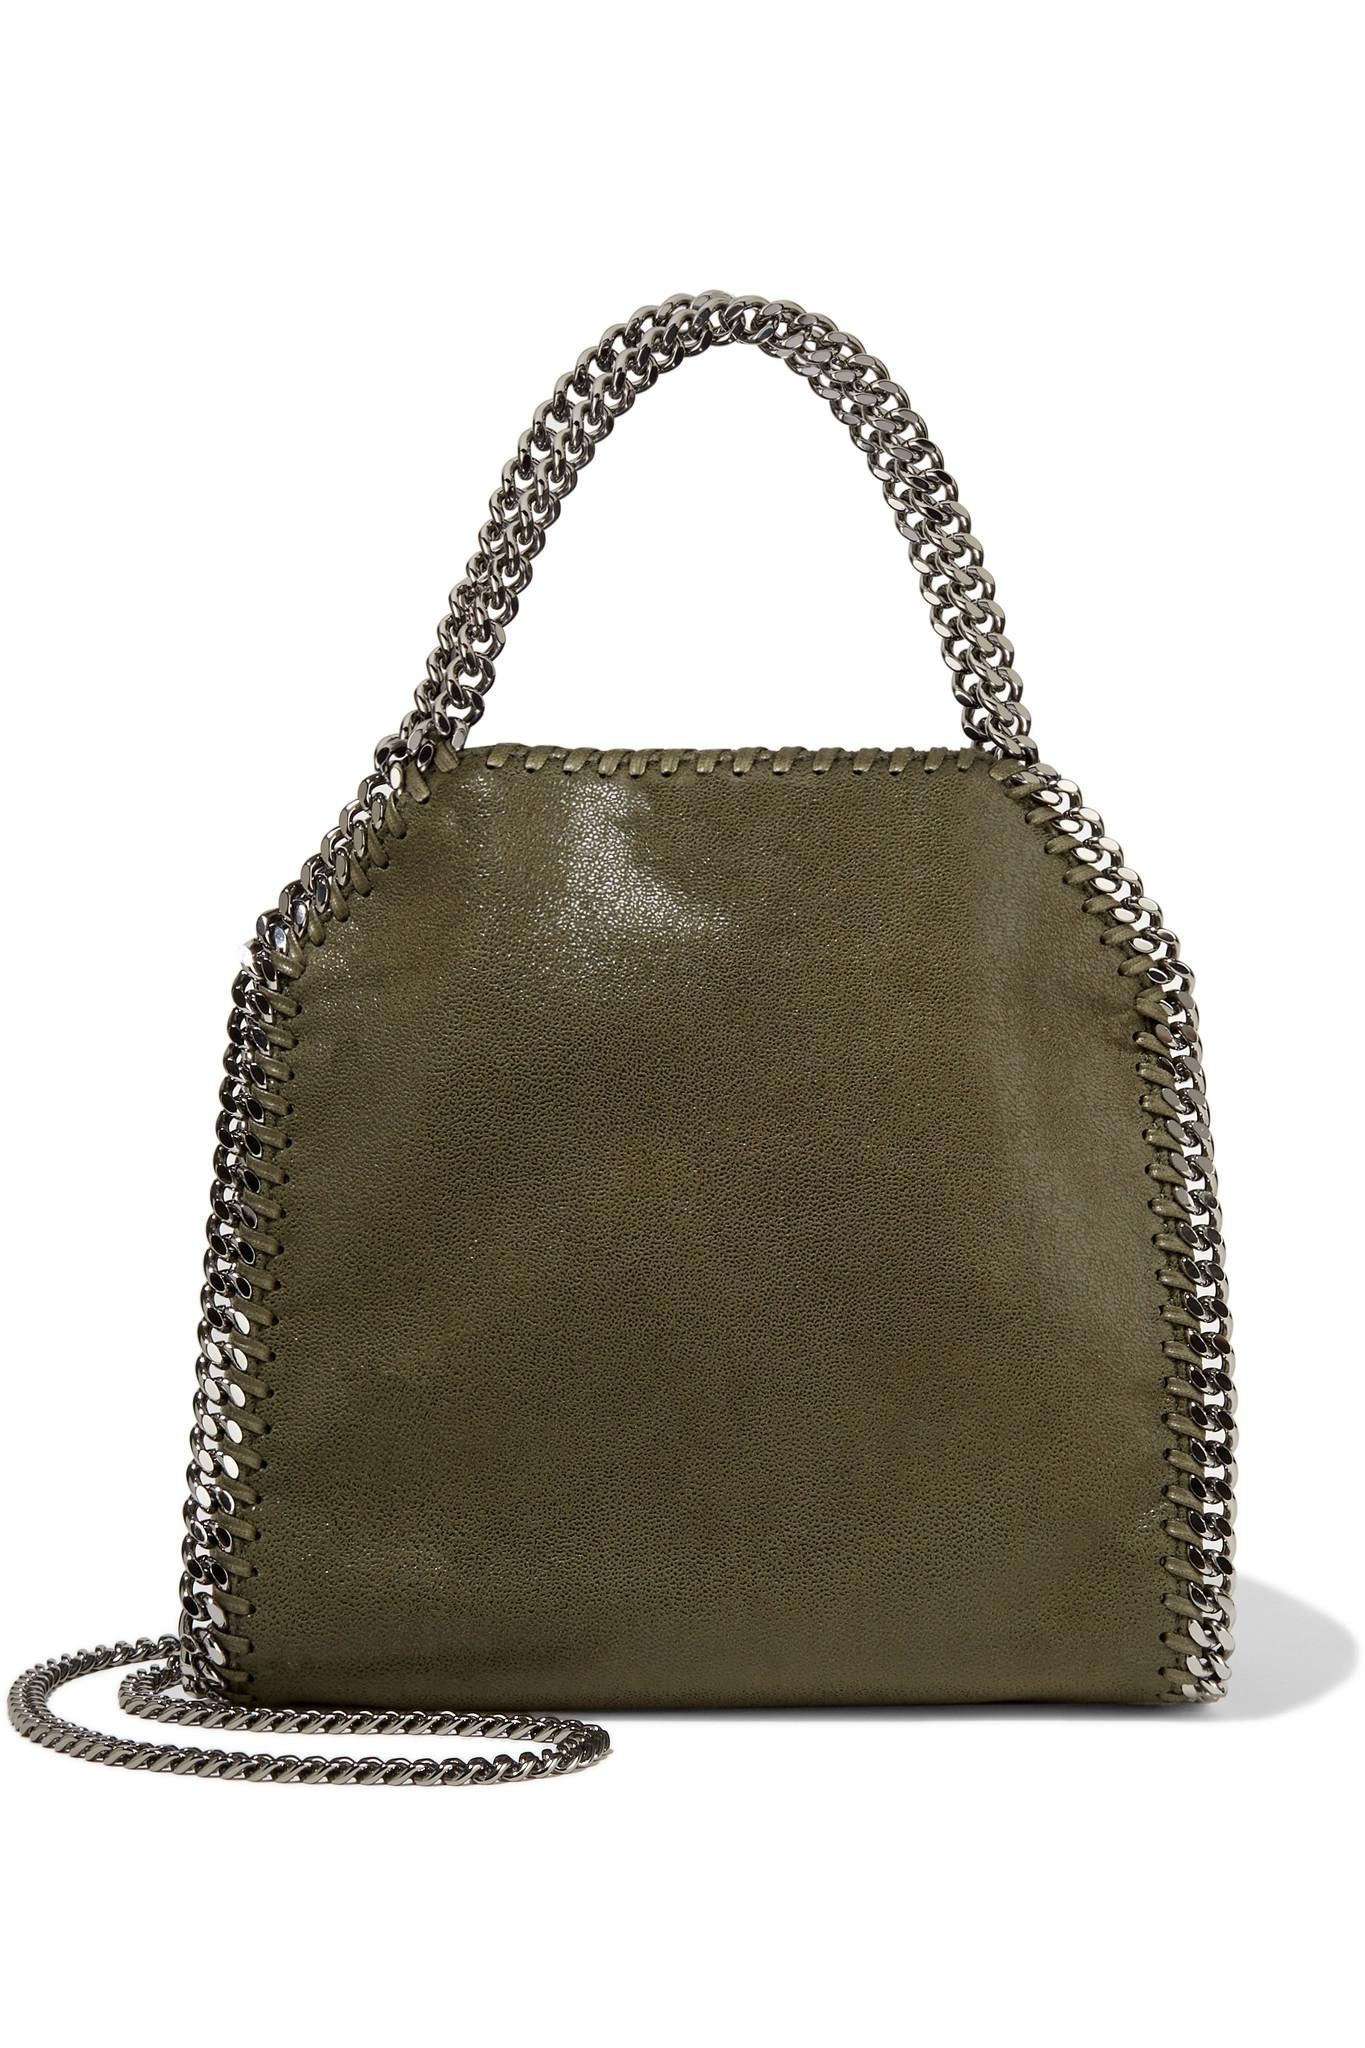 Lyst - Stella McCartney Falabella Mini Faux Brushed-leather Shoulder ... dd348c875e407